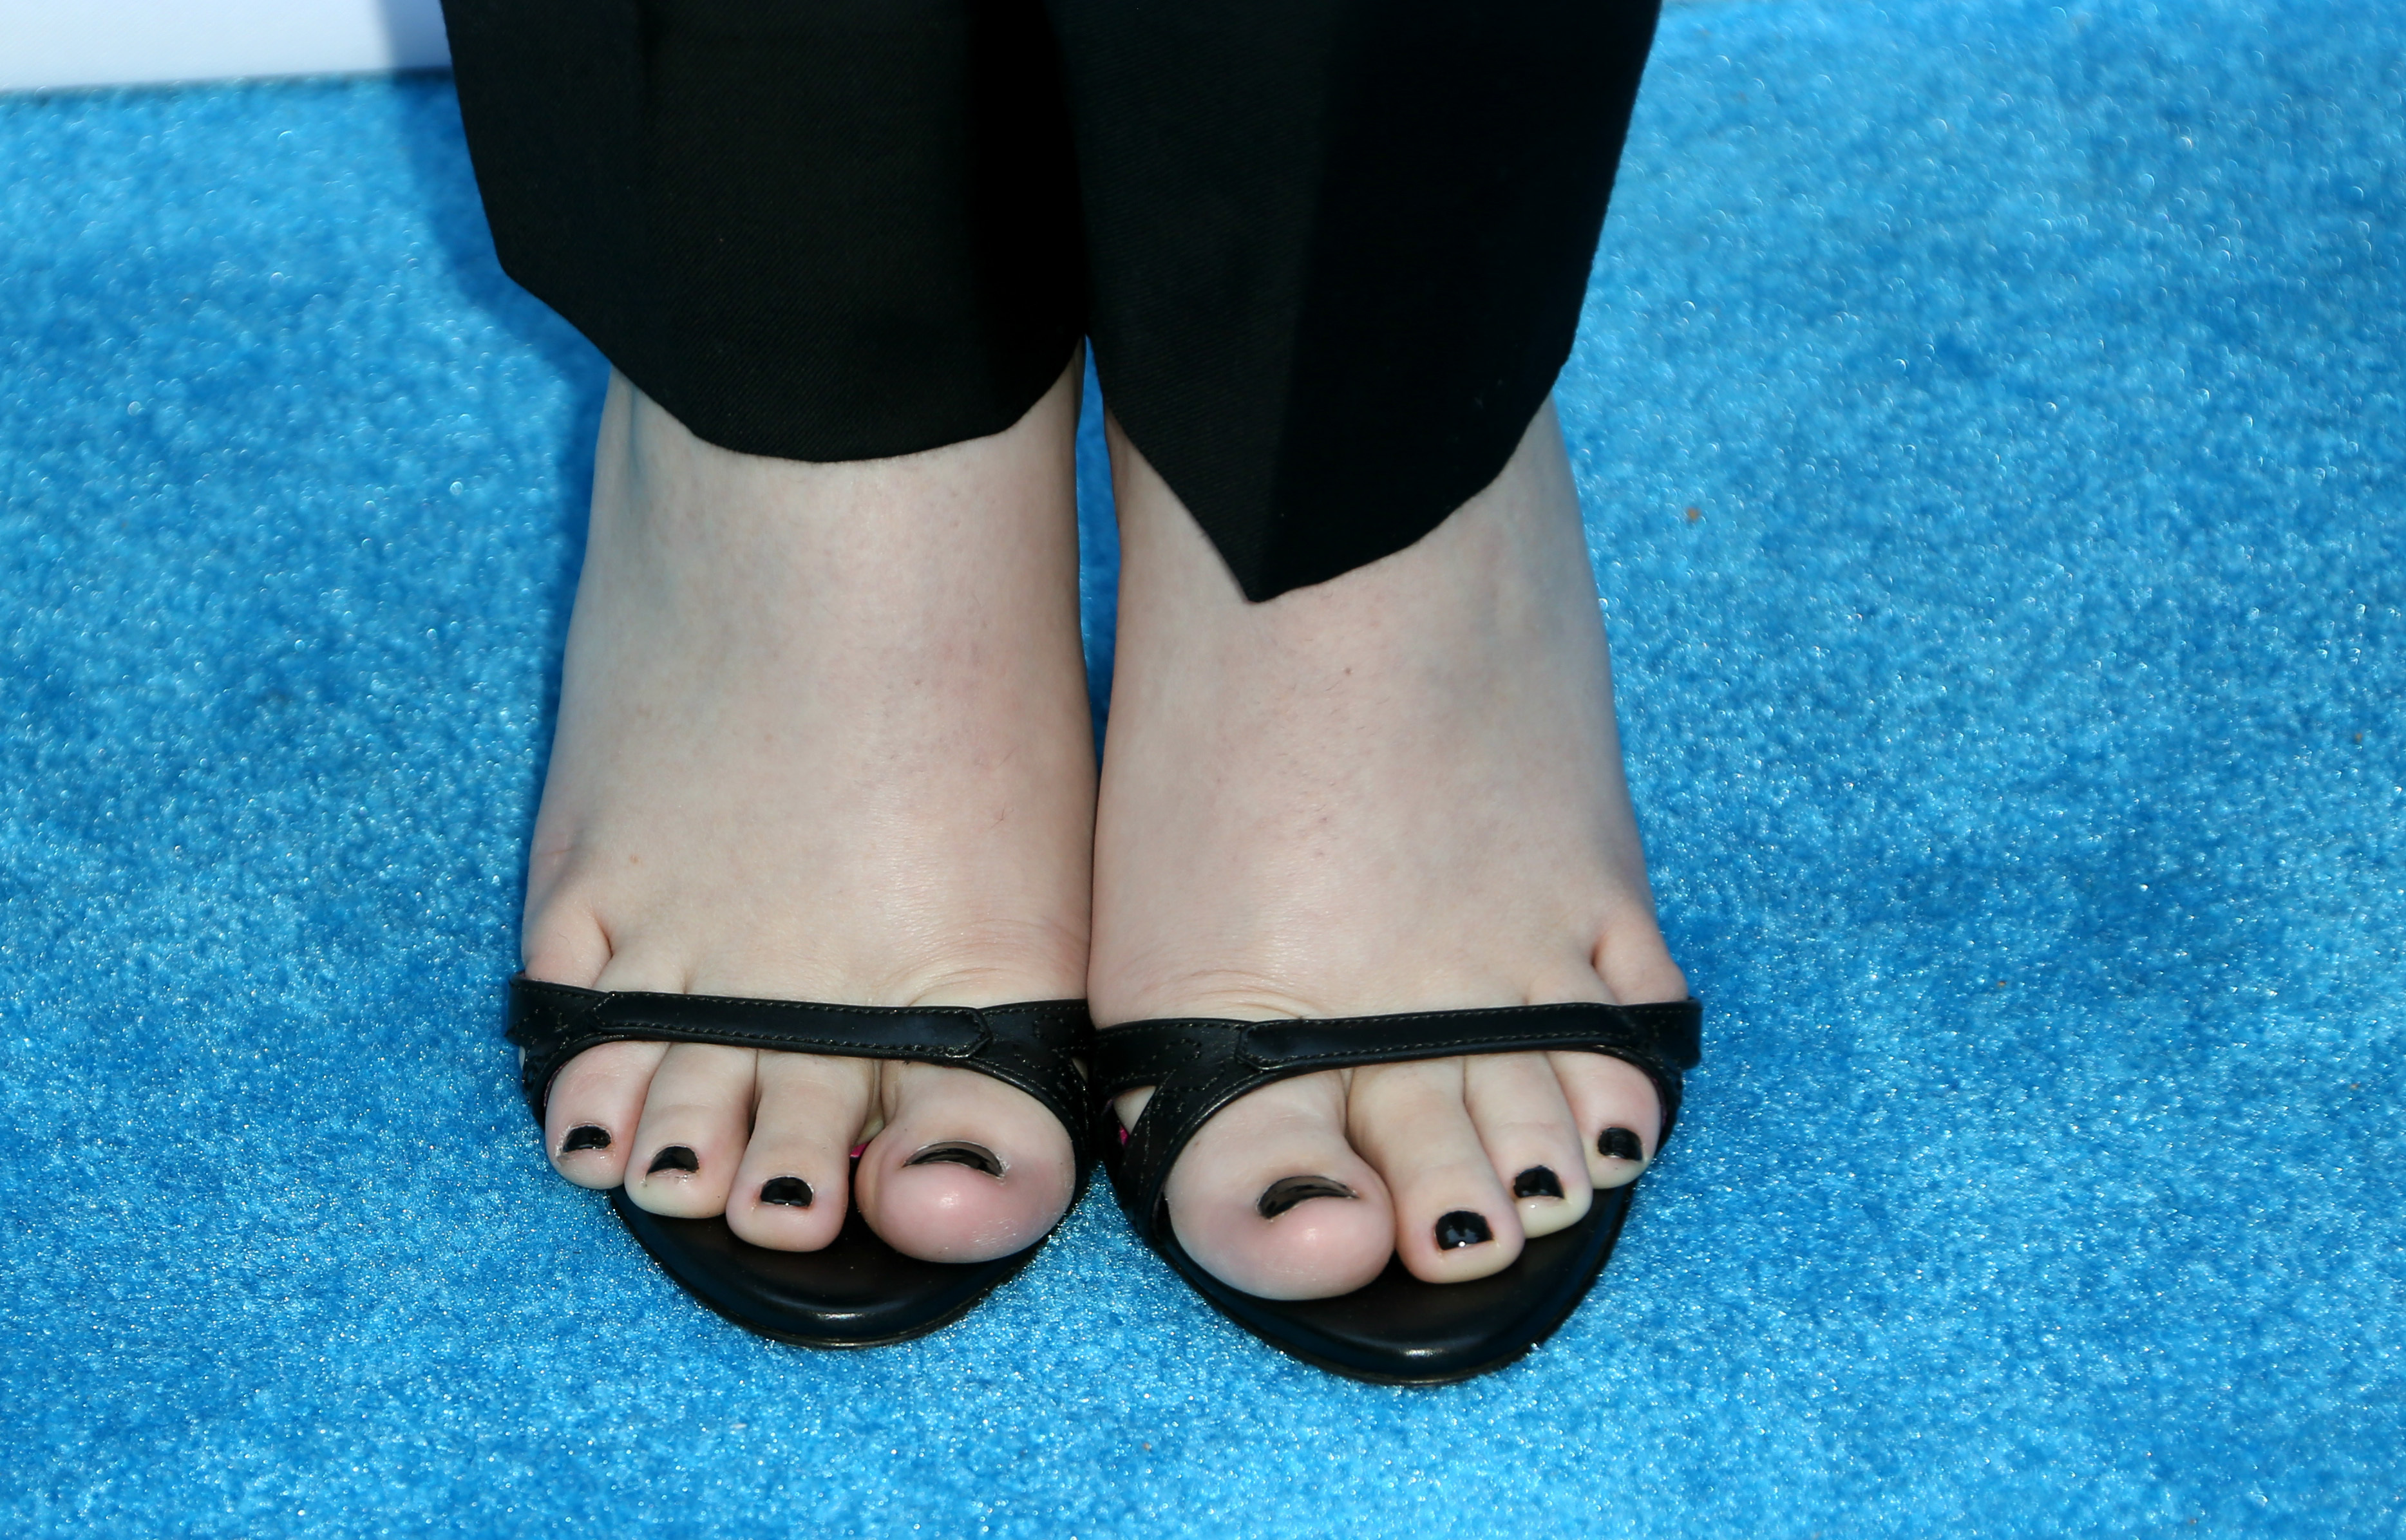 Chubby feet pics